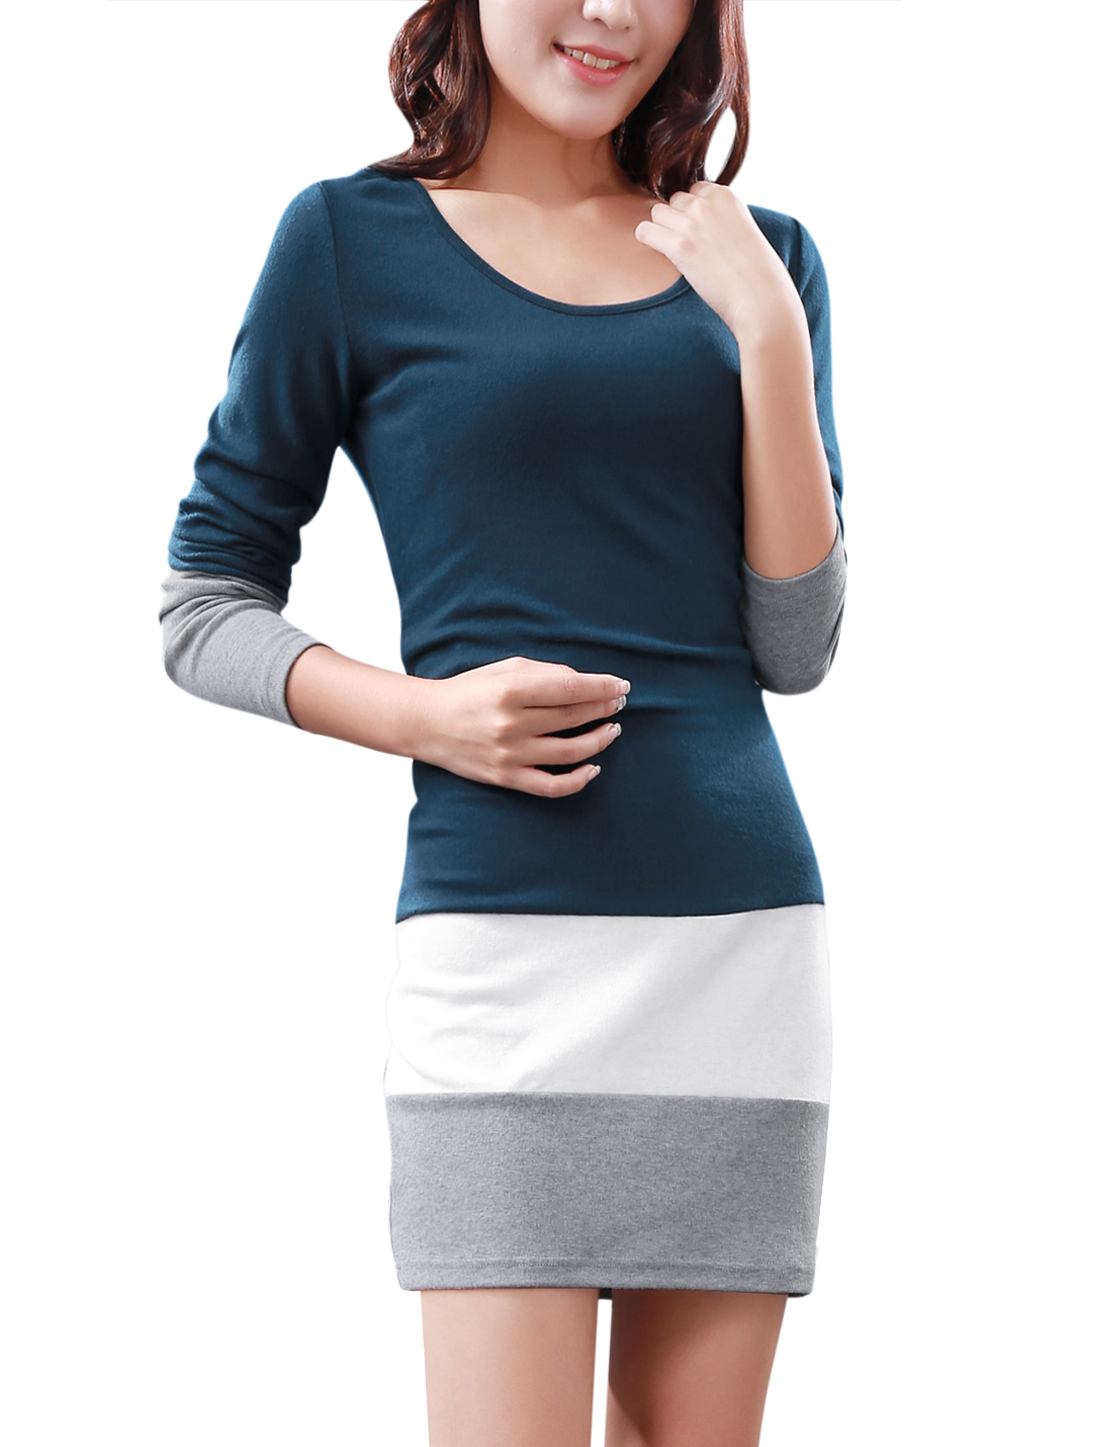 Ladies Scoop Neck Splice Long Sleeve Design Navy Blue Tunic Dress M